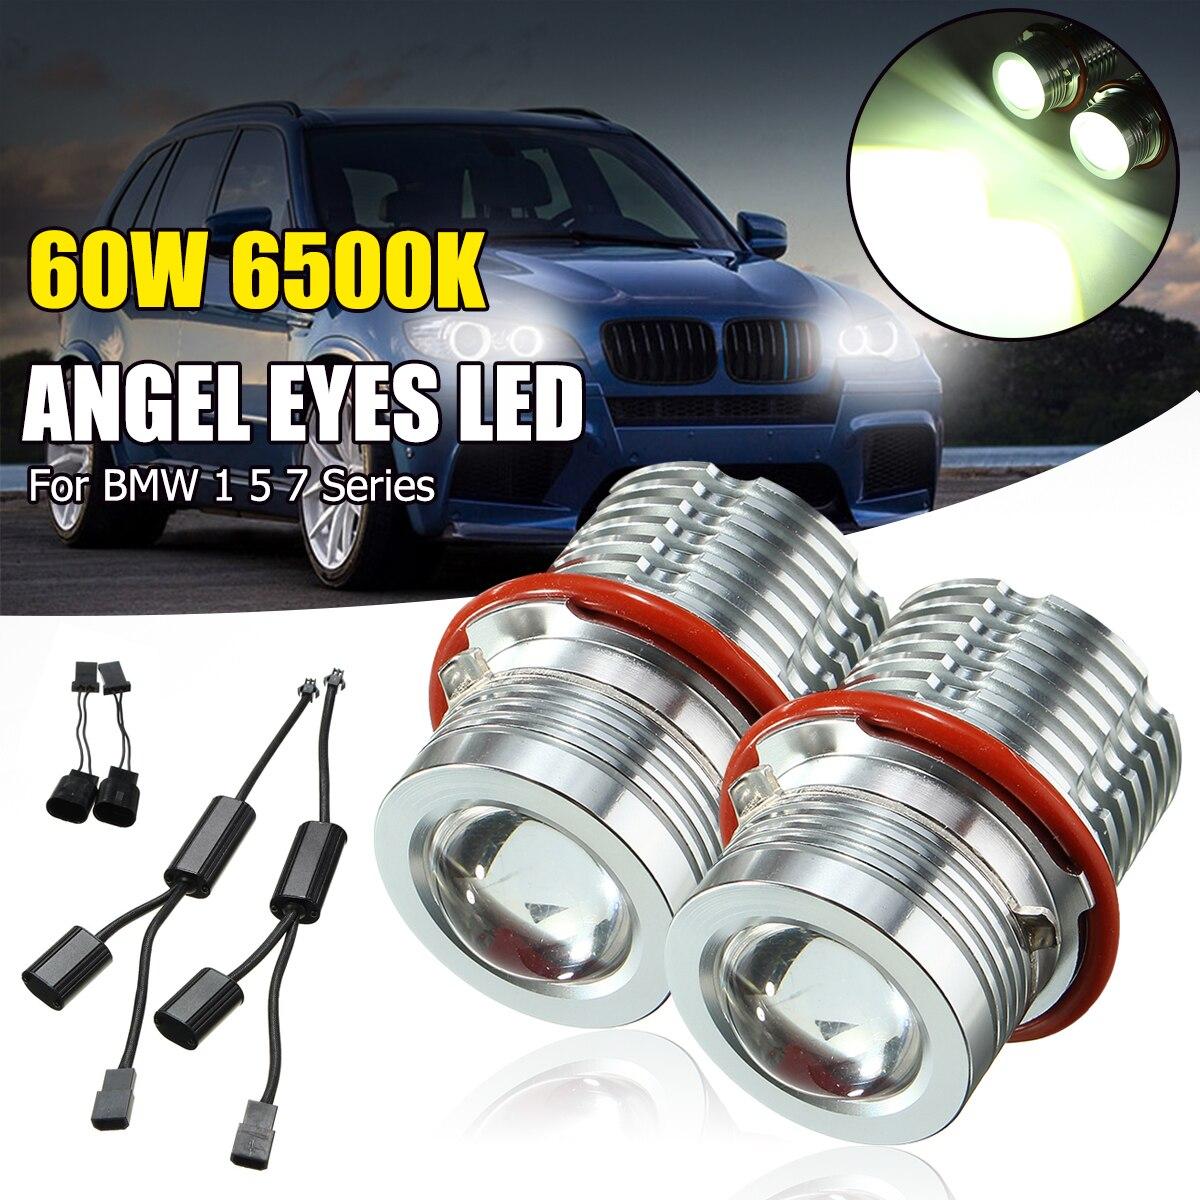 LED Angel Eyes Halo Ring Bulbs 80W 6000K White for BMW E39 E60 1-series 5-series 7-series X-series 2 Sets